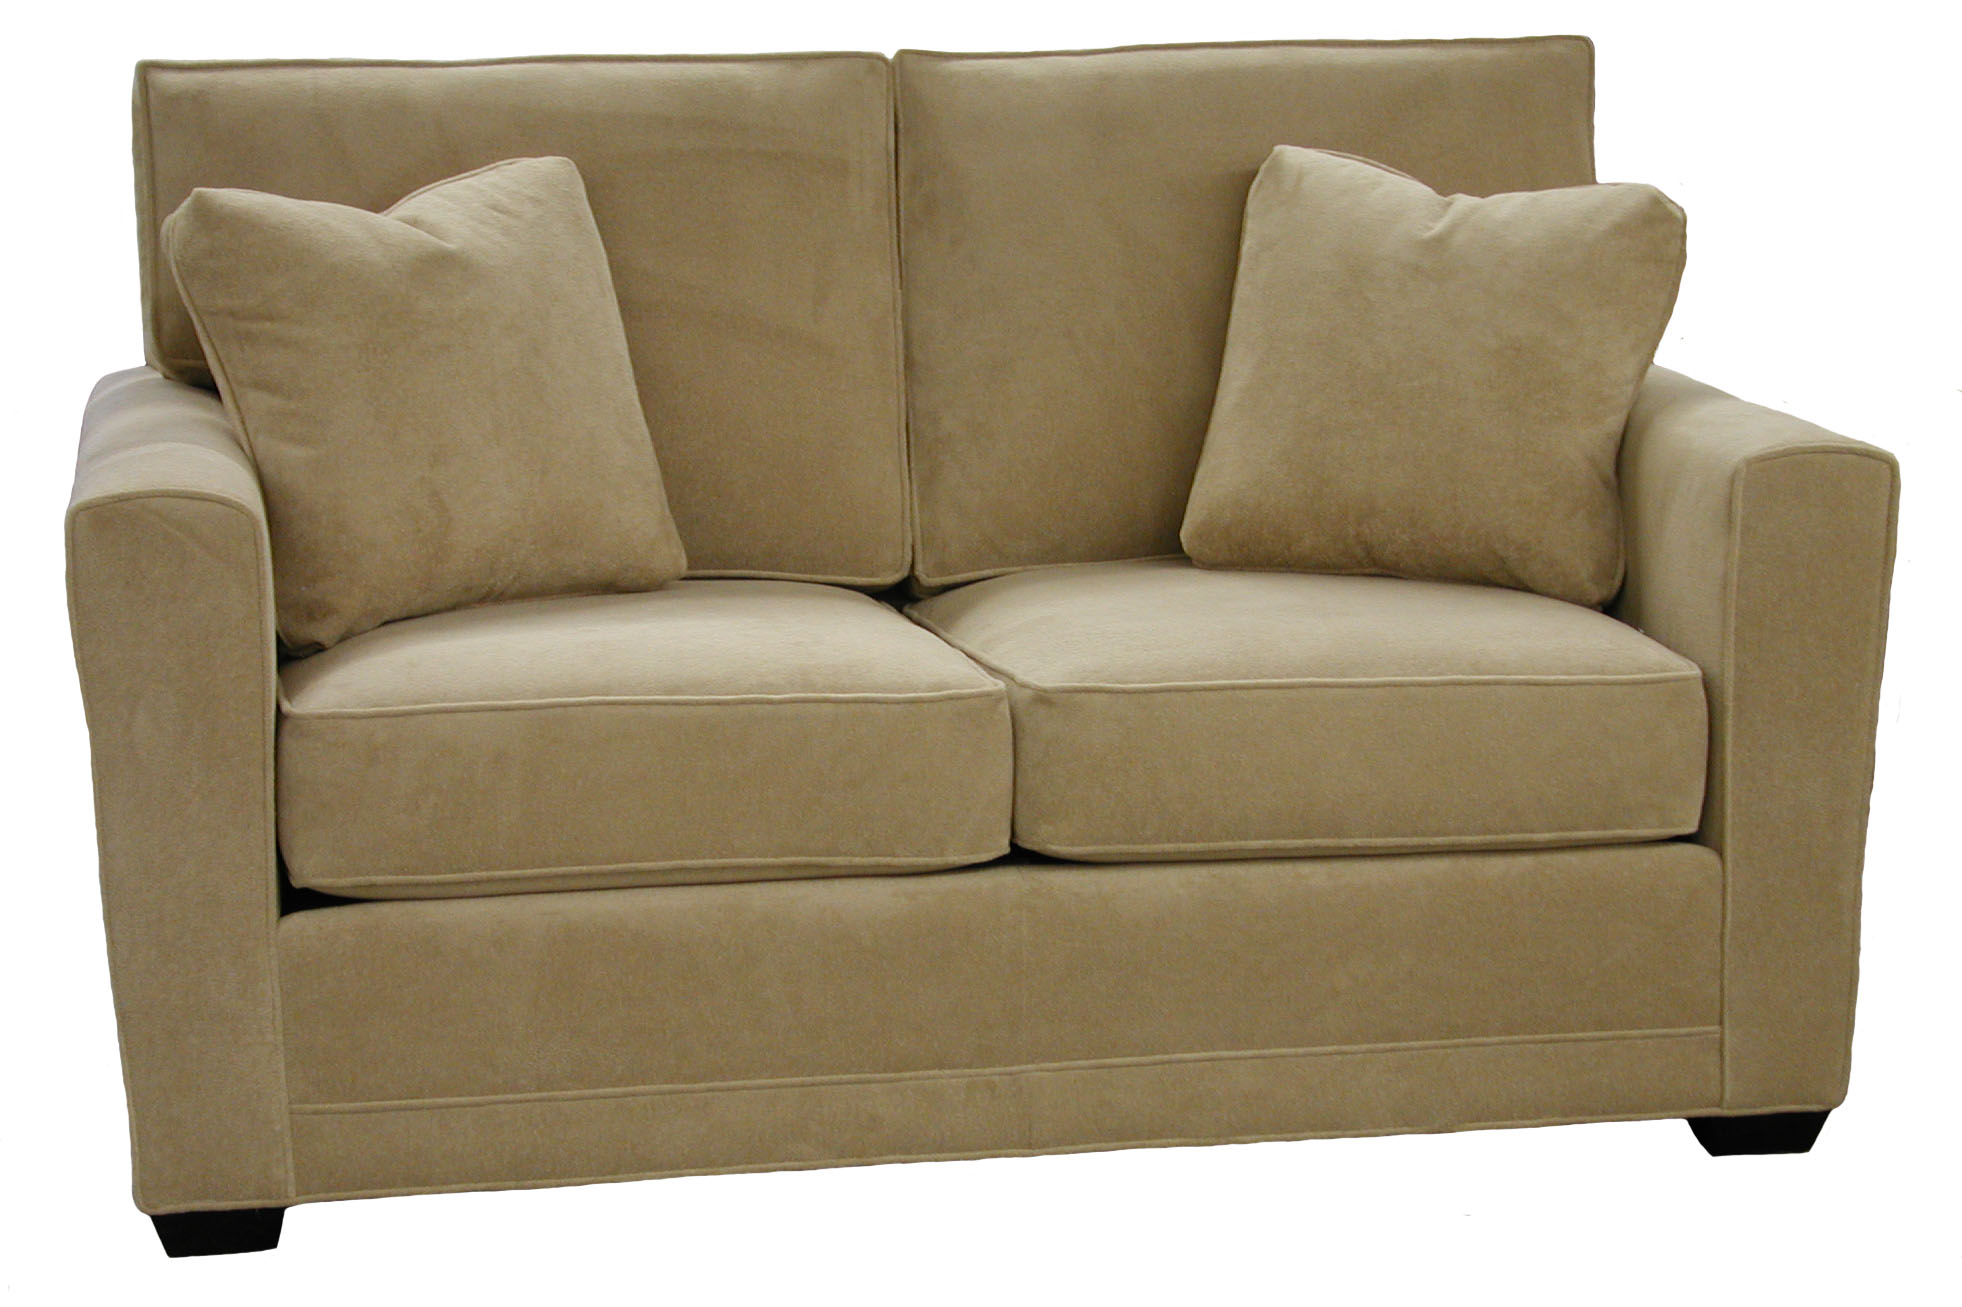 Henley Full Sleeper Sofa Couch Carolina Chair American